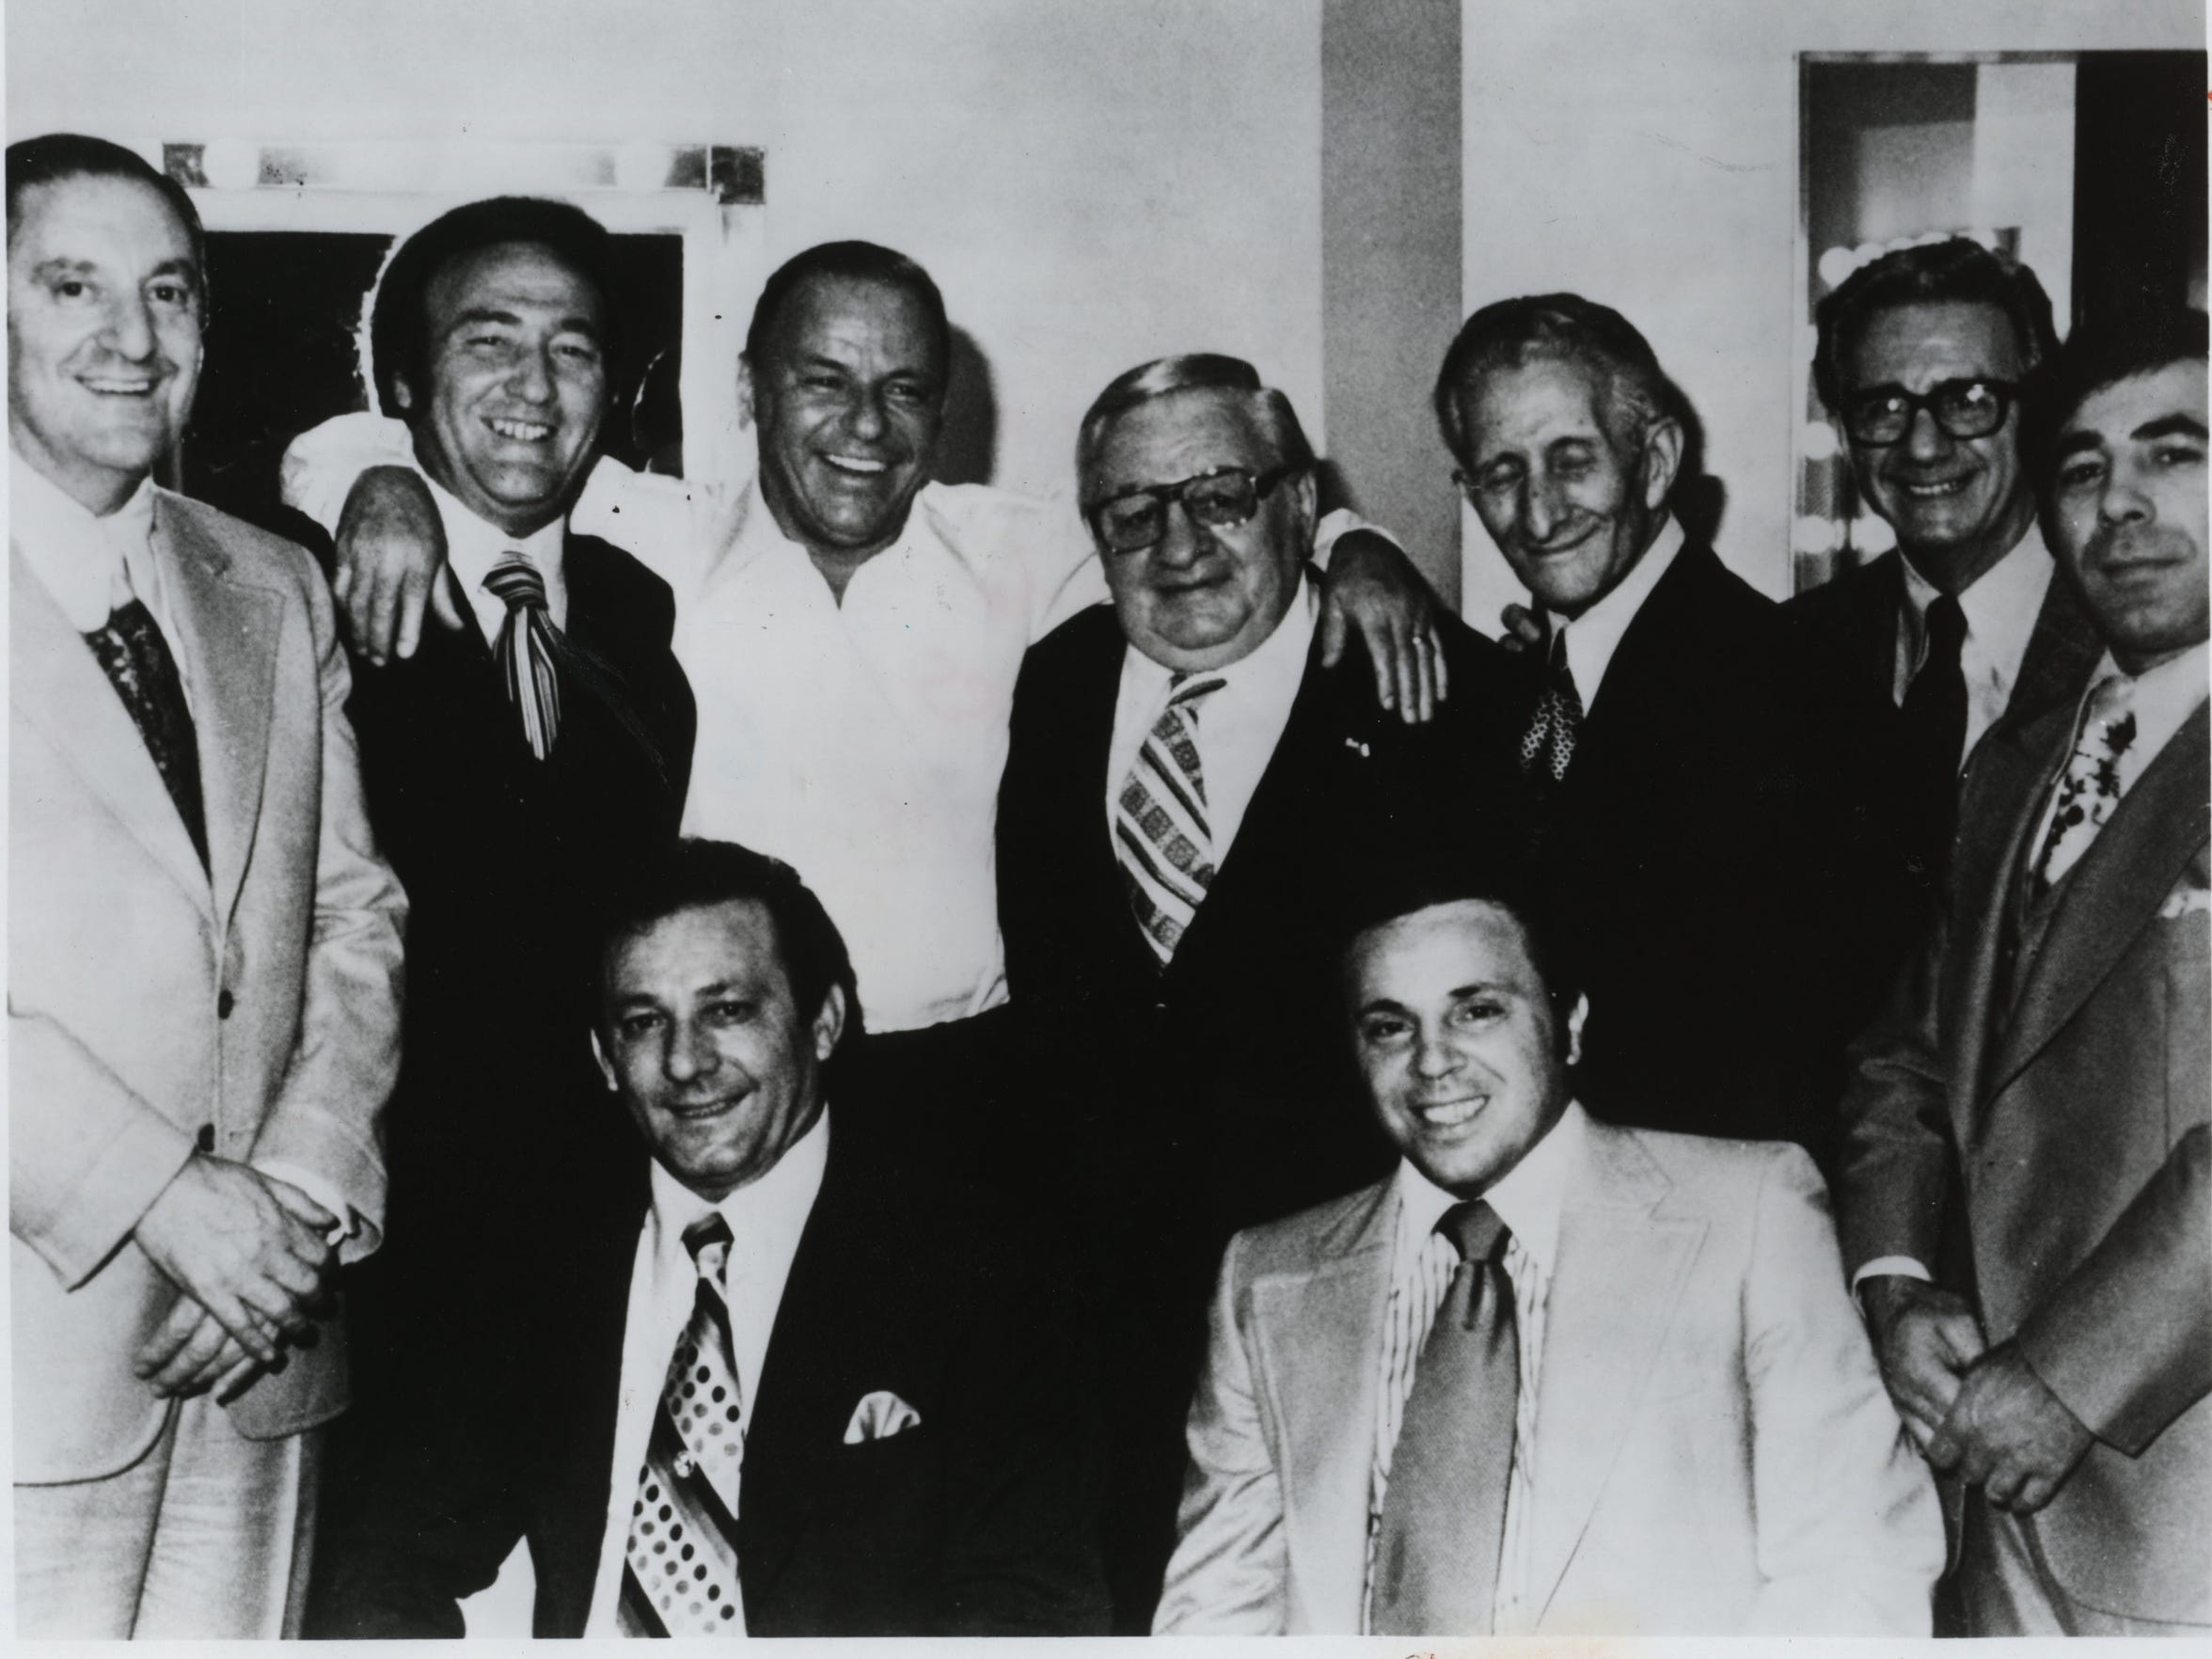 Paul Castellano (from left), Gregory DePalma, Frank